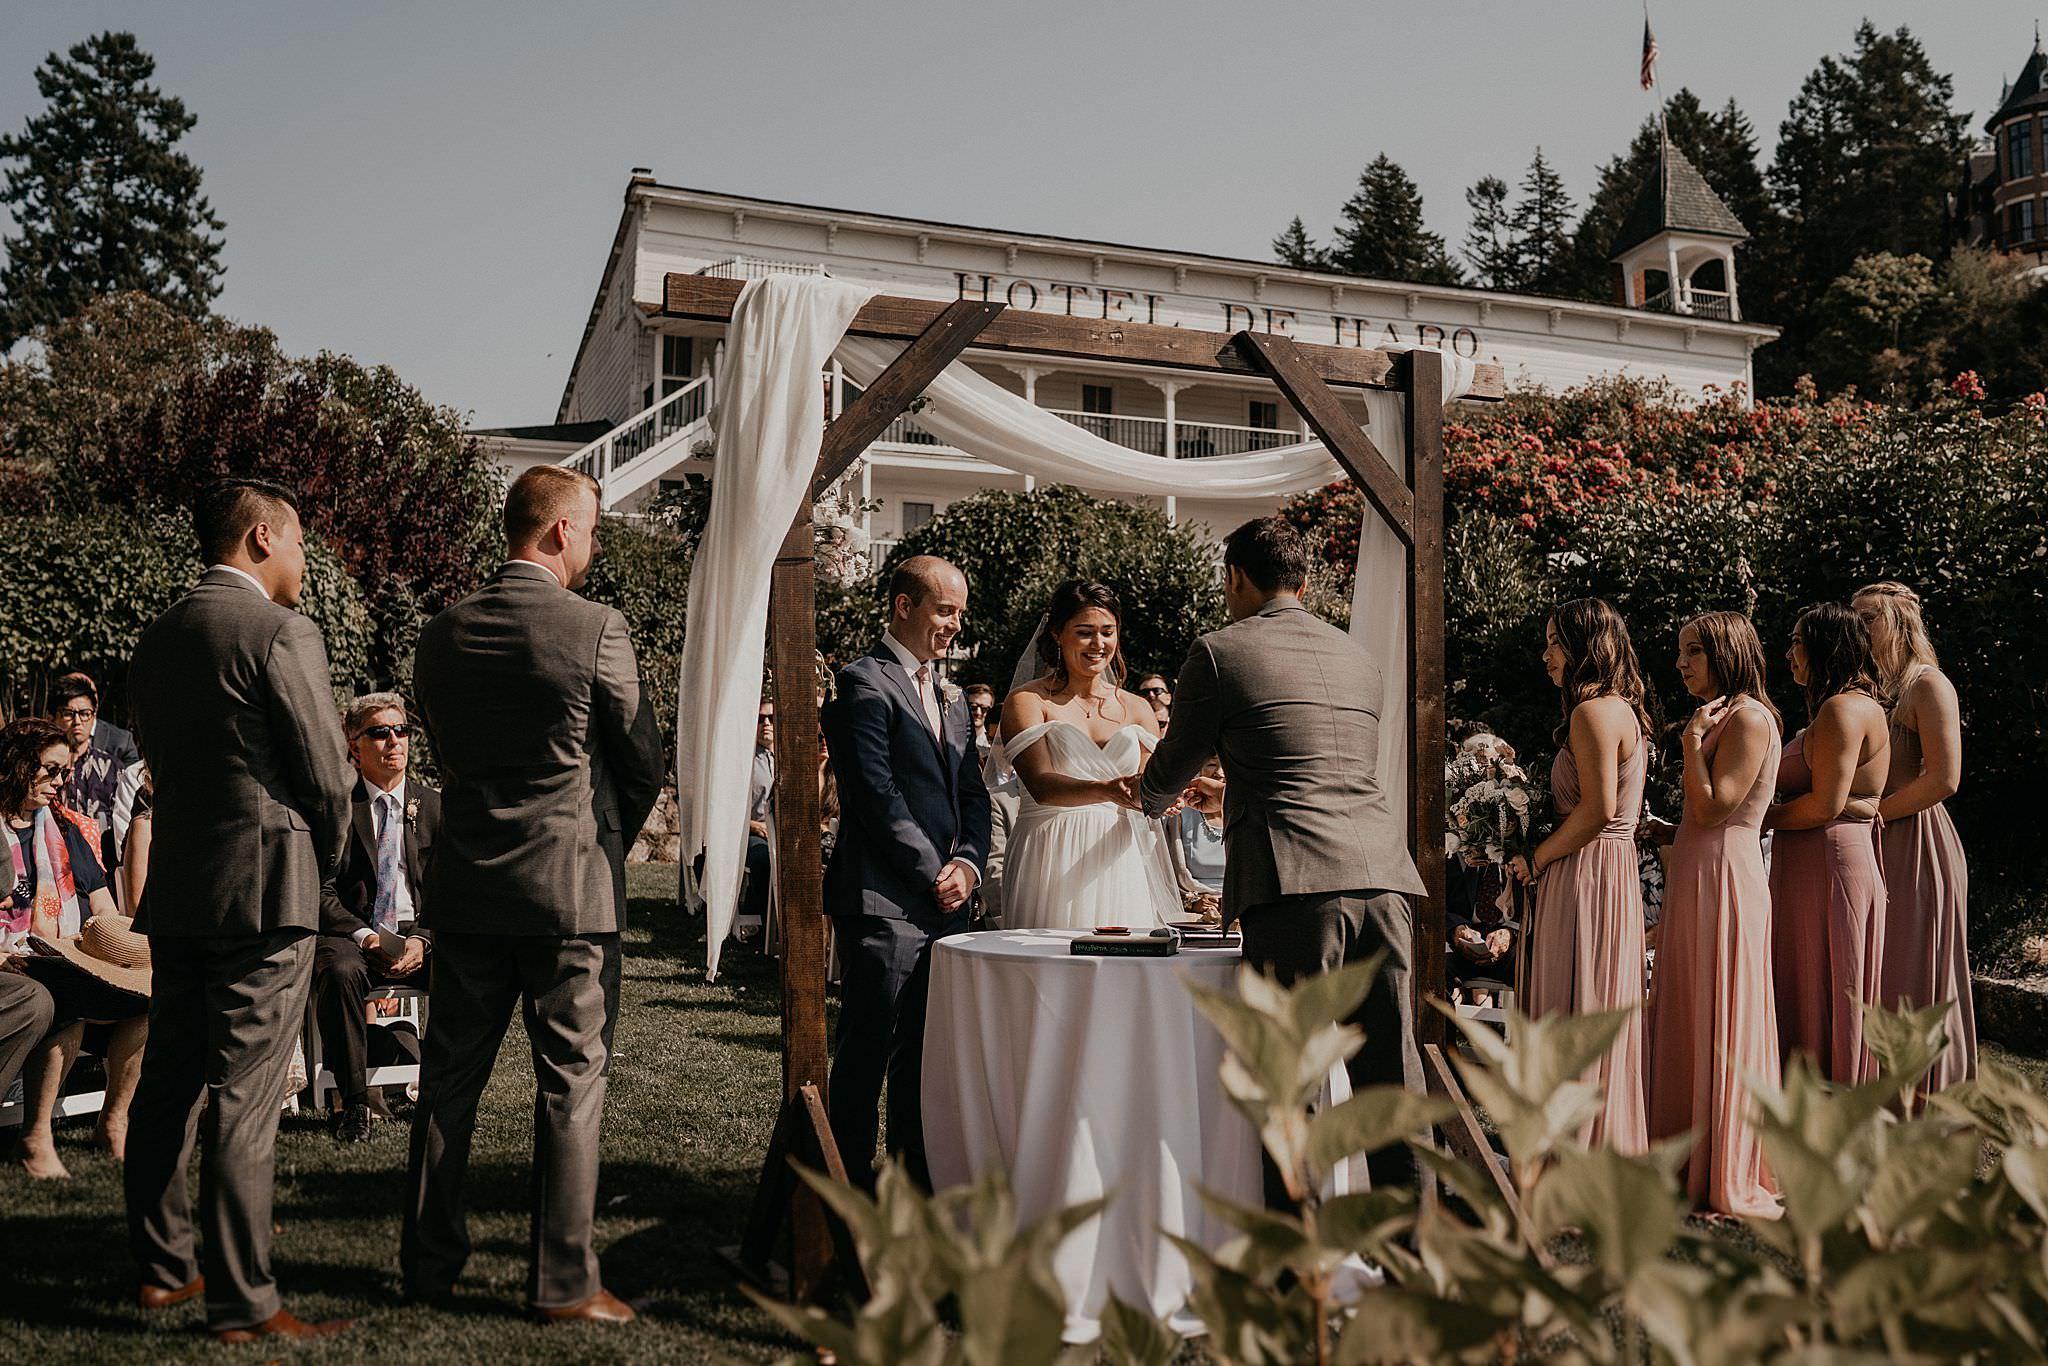 San San Kudo tea ceremony at Roche Harbor wedding ceremony